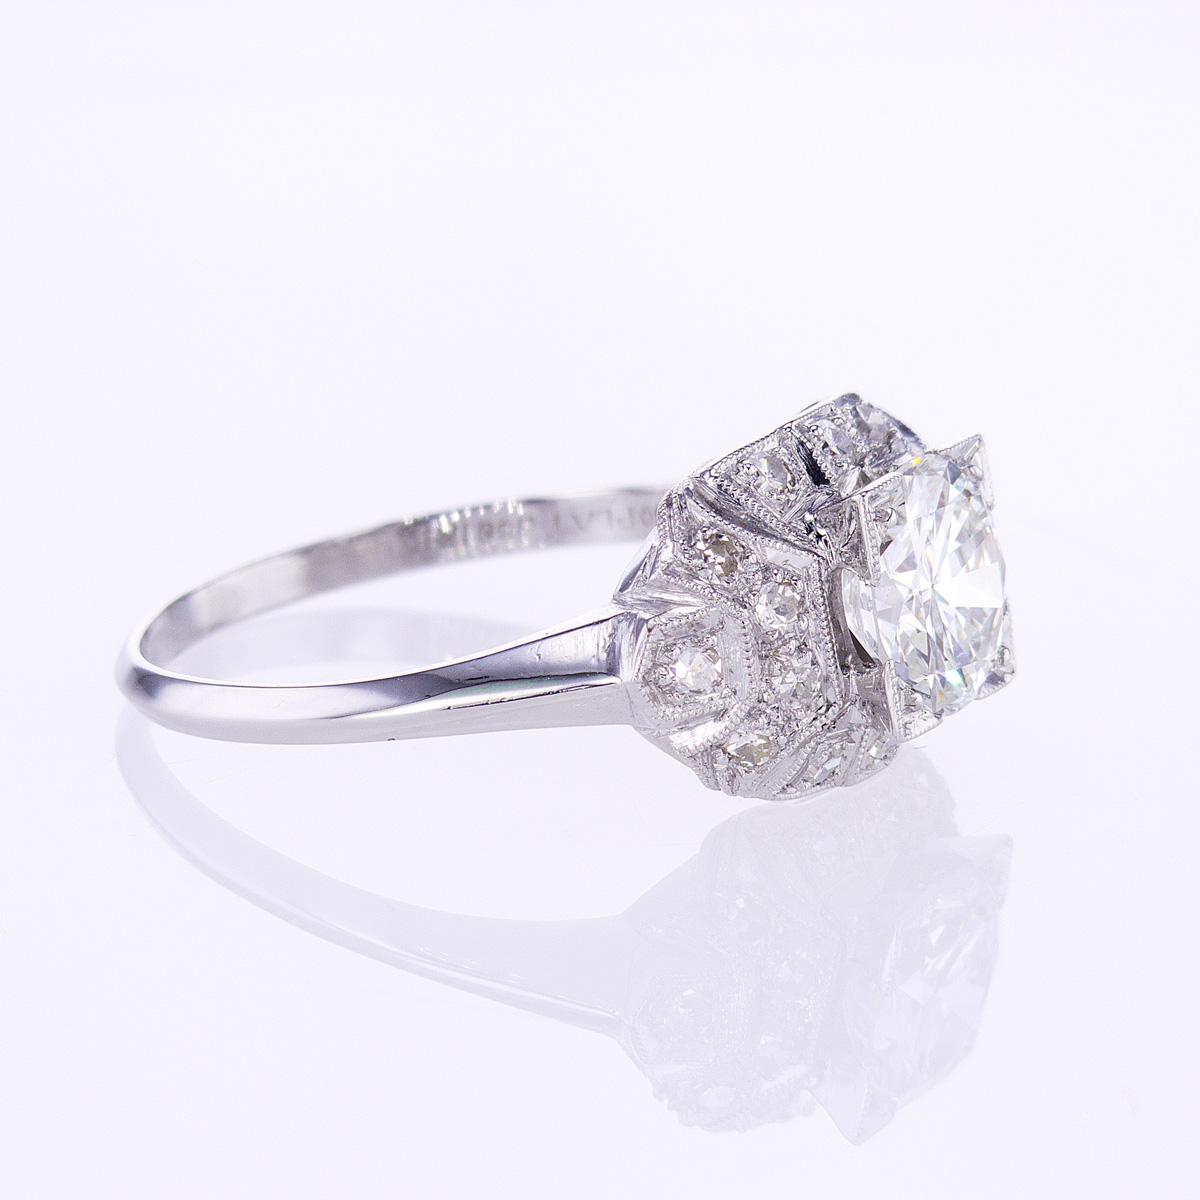 Vintage Art Deco Diamond Engagement Ring, Platinum